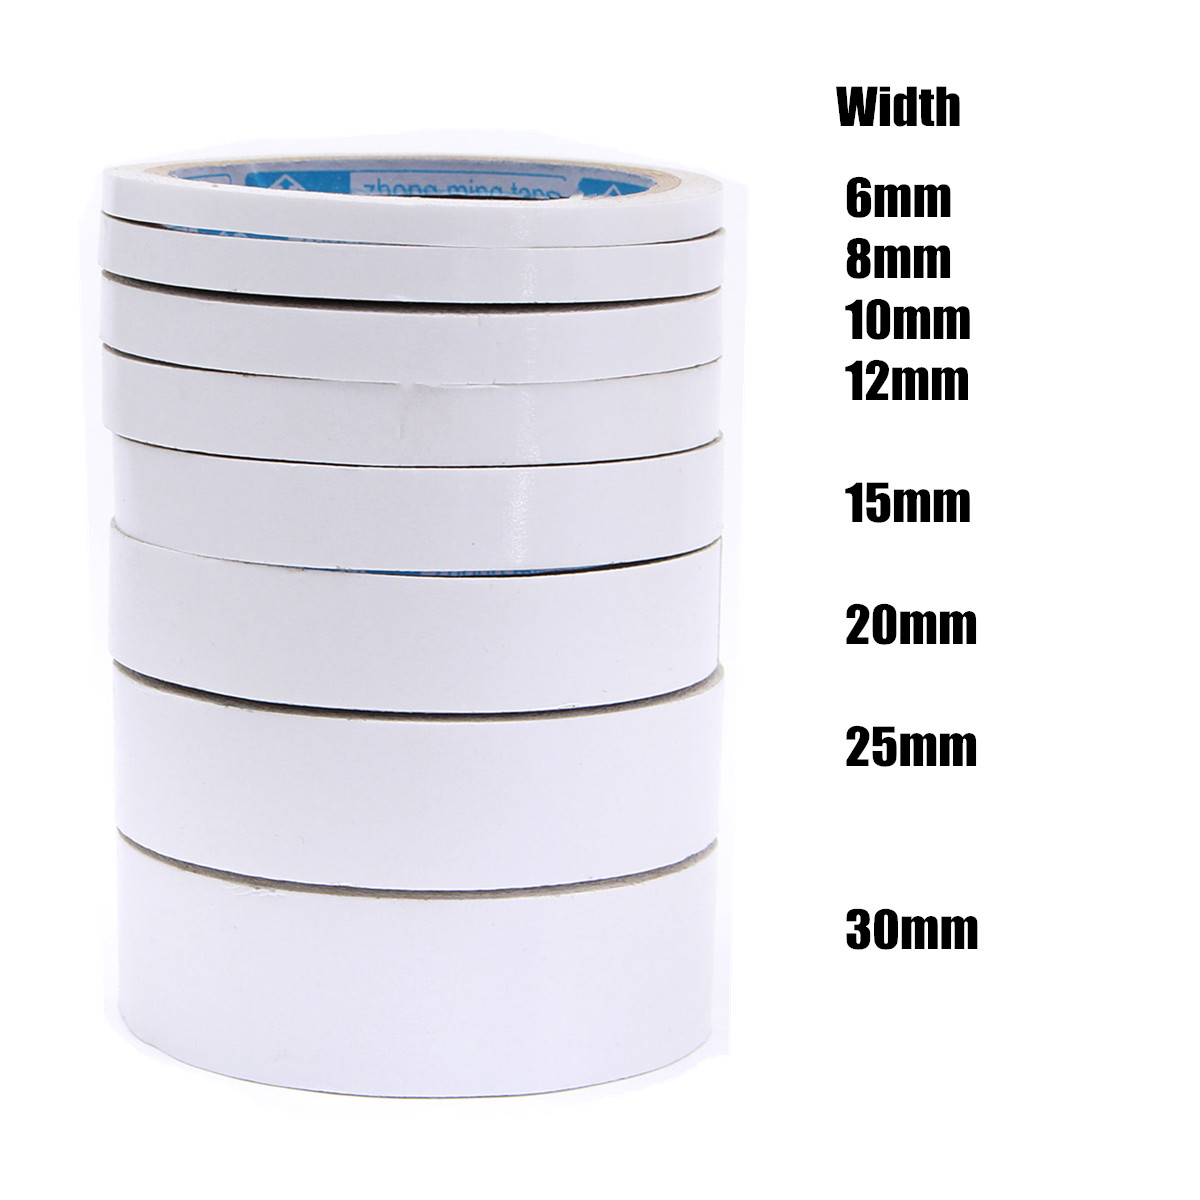 10m rouleau ruban bande auto adhesif papier double face colle tape sticker blanc ebay. Black Bedroom Furniture Sets. Home Design Ideas